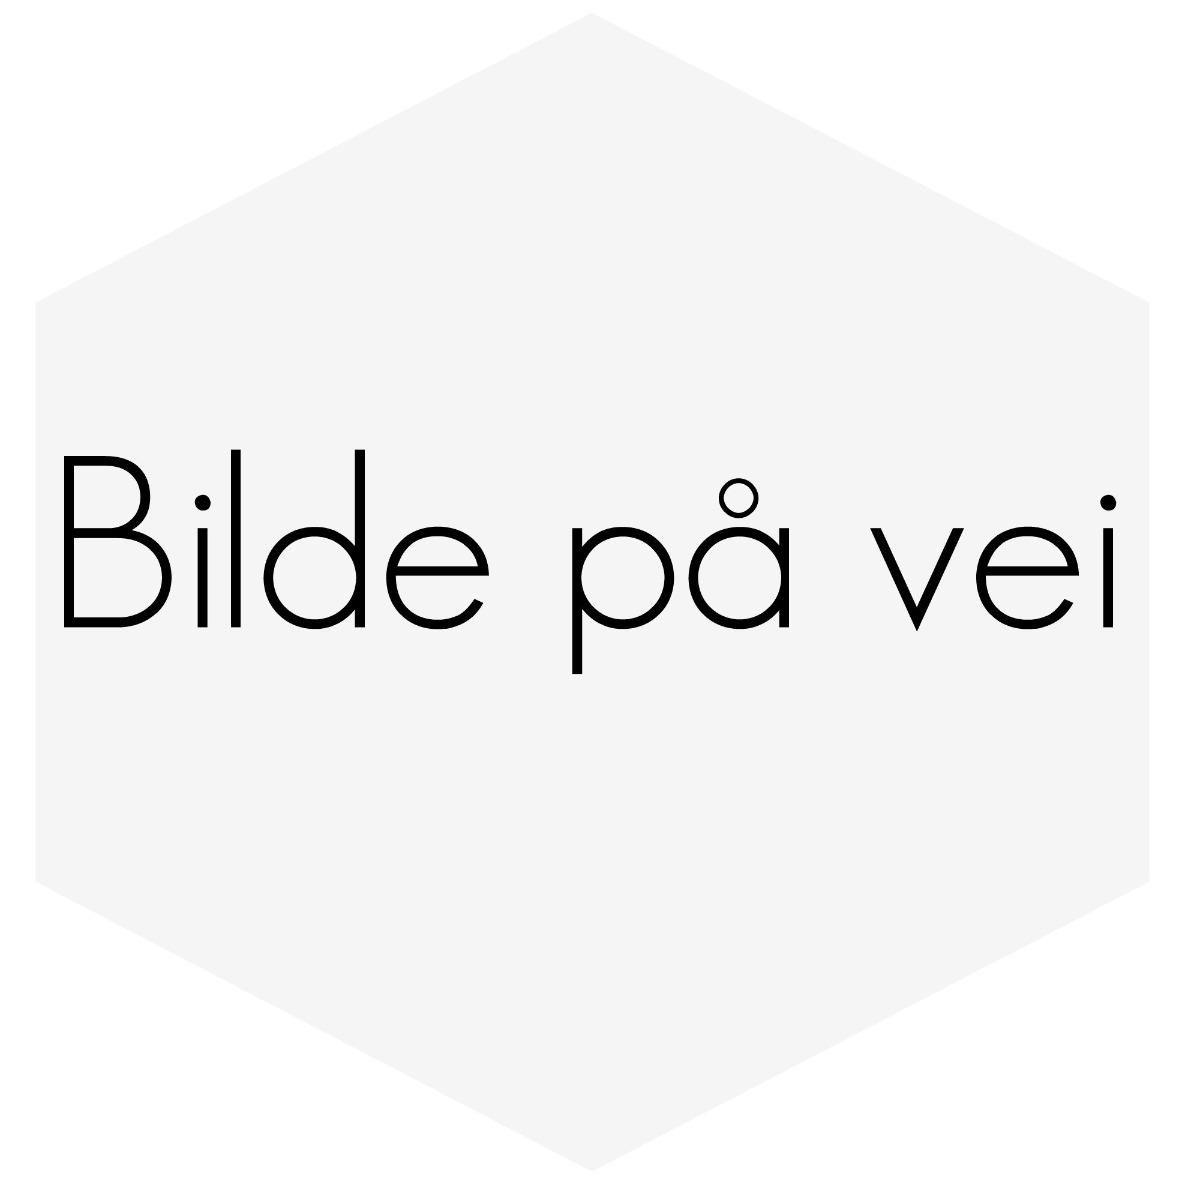 SPEIL KOMPLETT TIL VOLVO V70N,S60,V70N 00-03  V.S se info: